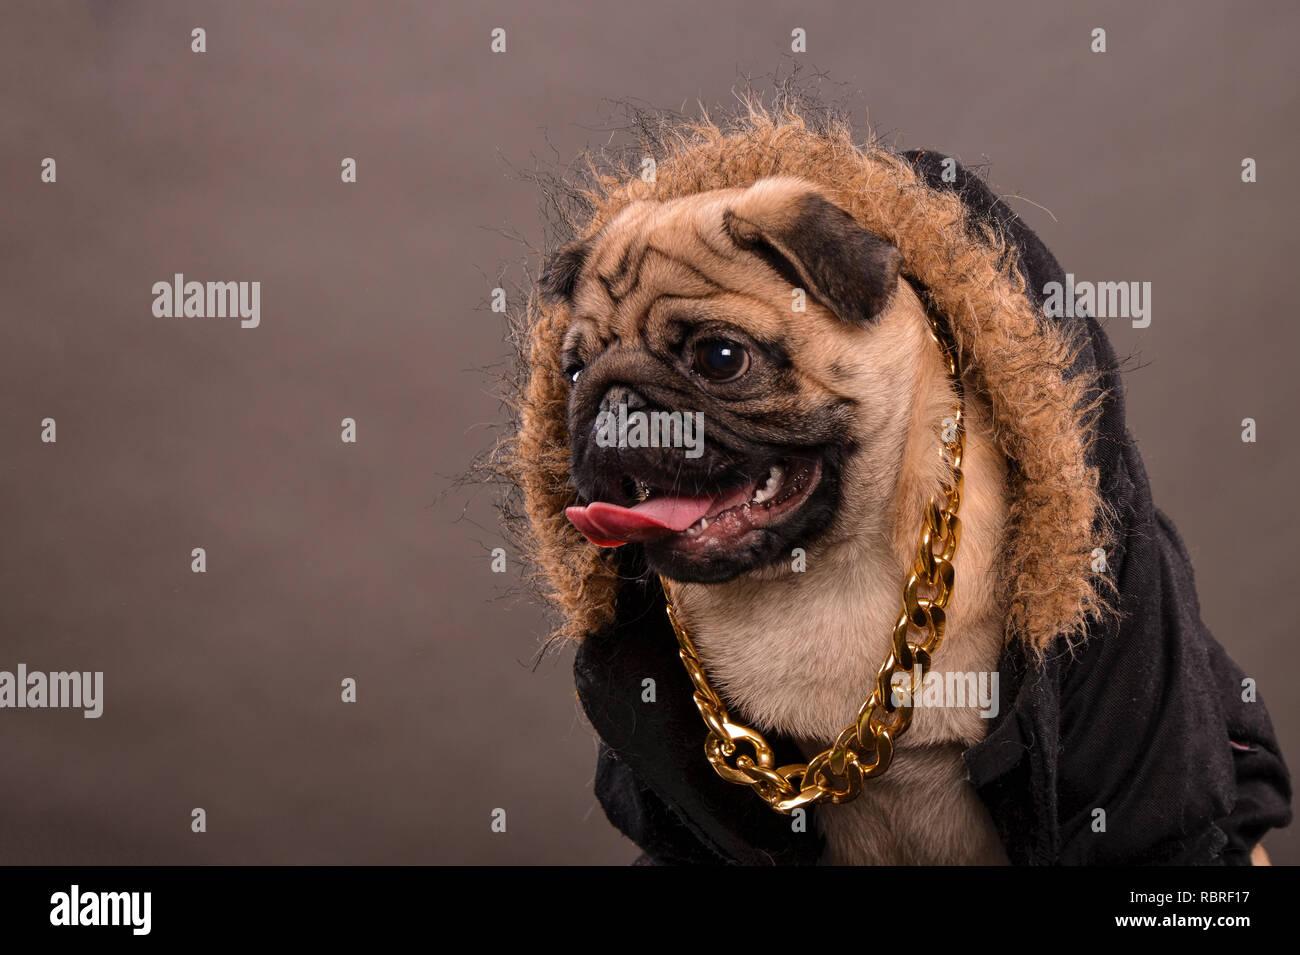 Pug dog wearing black jacket with fur hood and big golden necklace, gangster look, portrait, studio shot, horizontal orientation - Stock Image